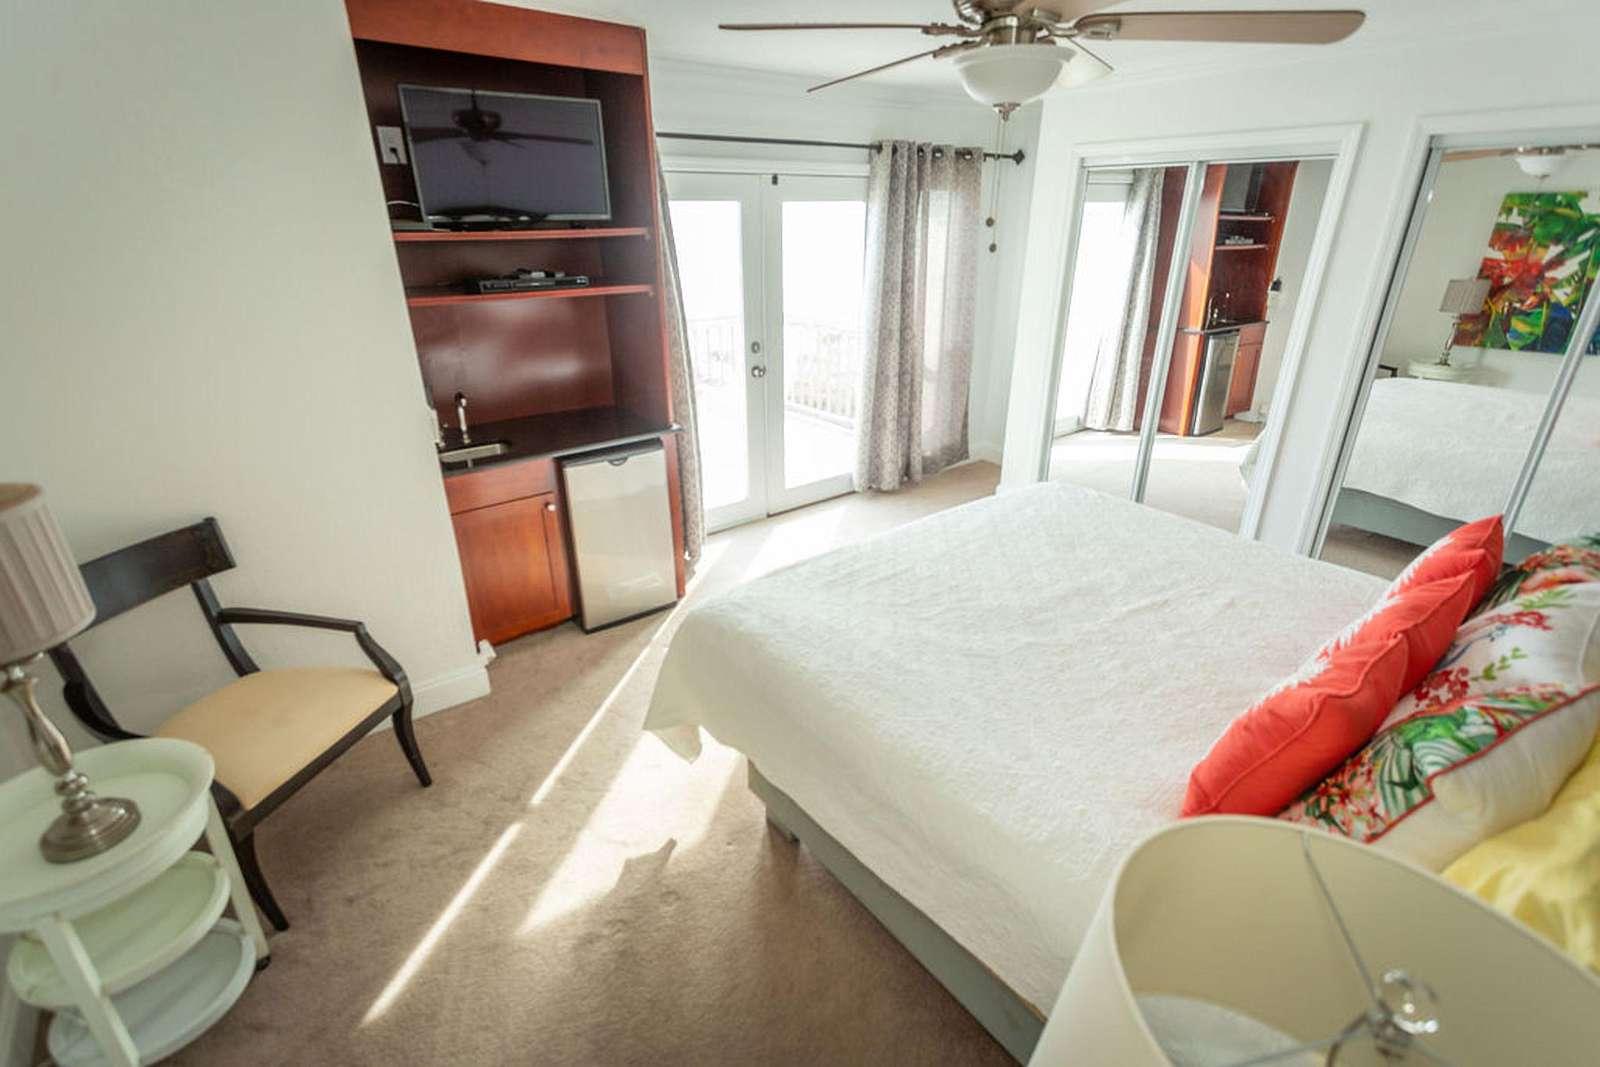 Br 2 has small fridge, flat screen and deck overlook gulf